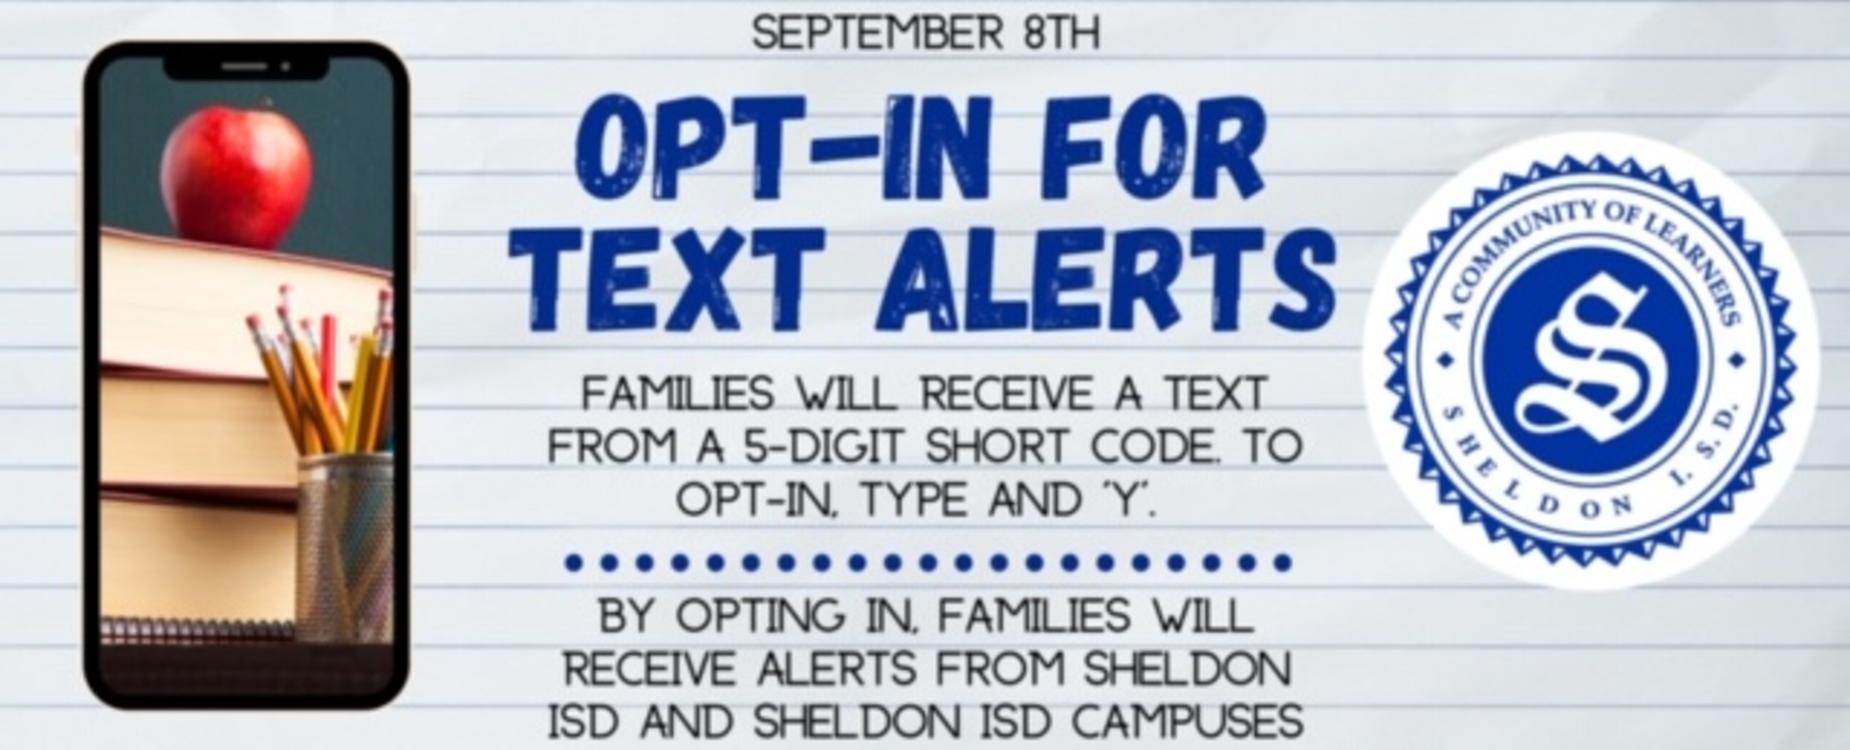 Placeholder text, please change